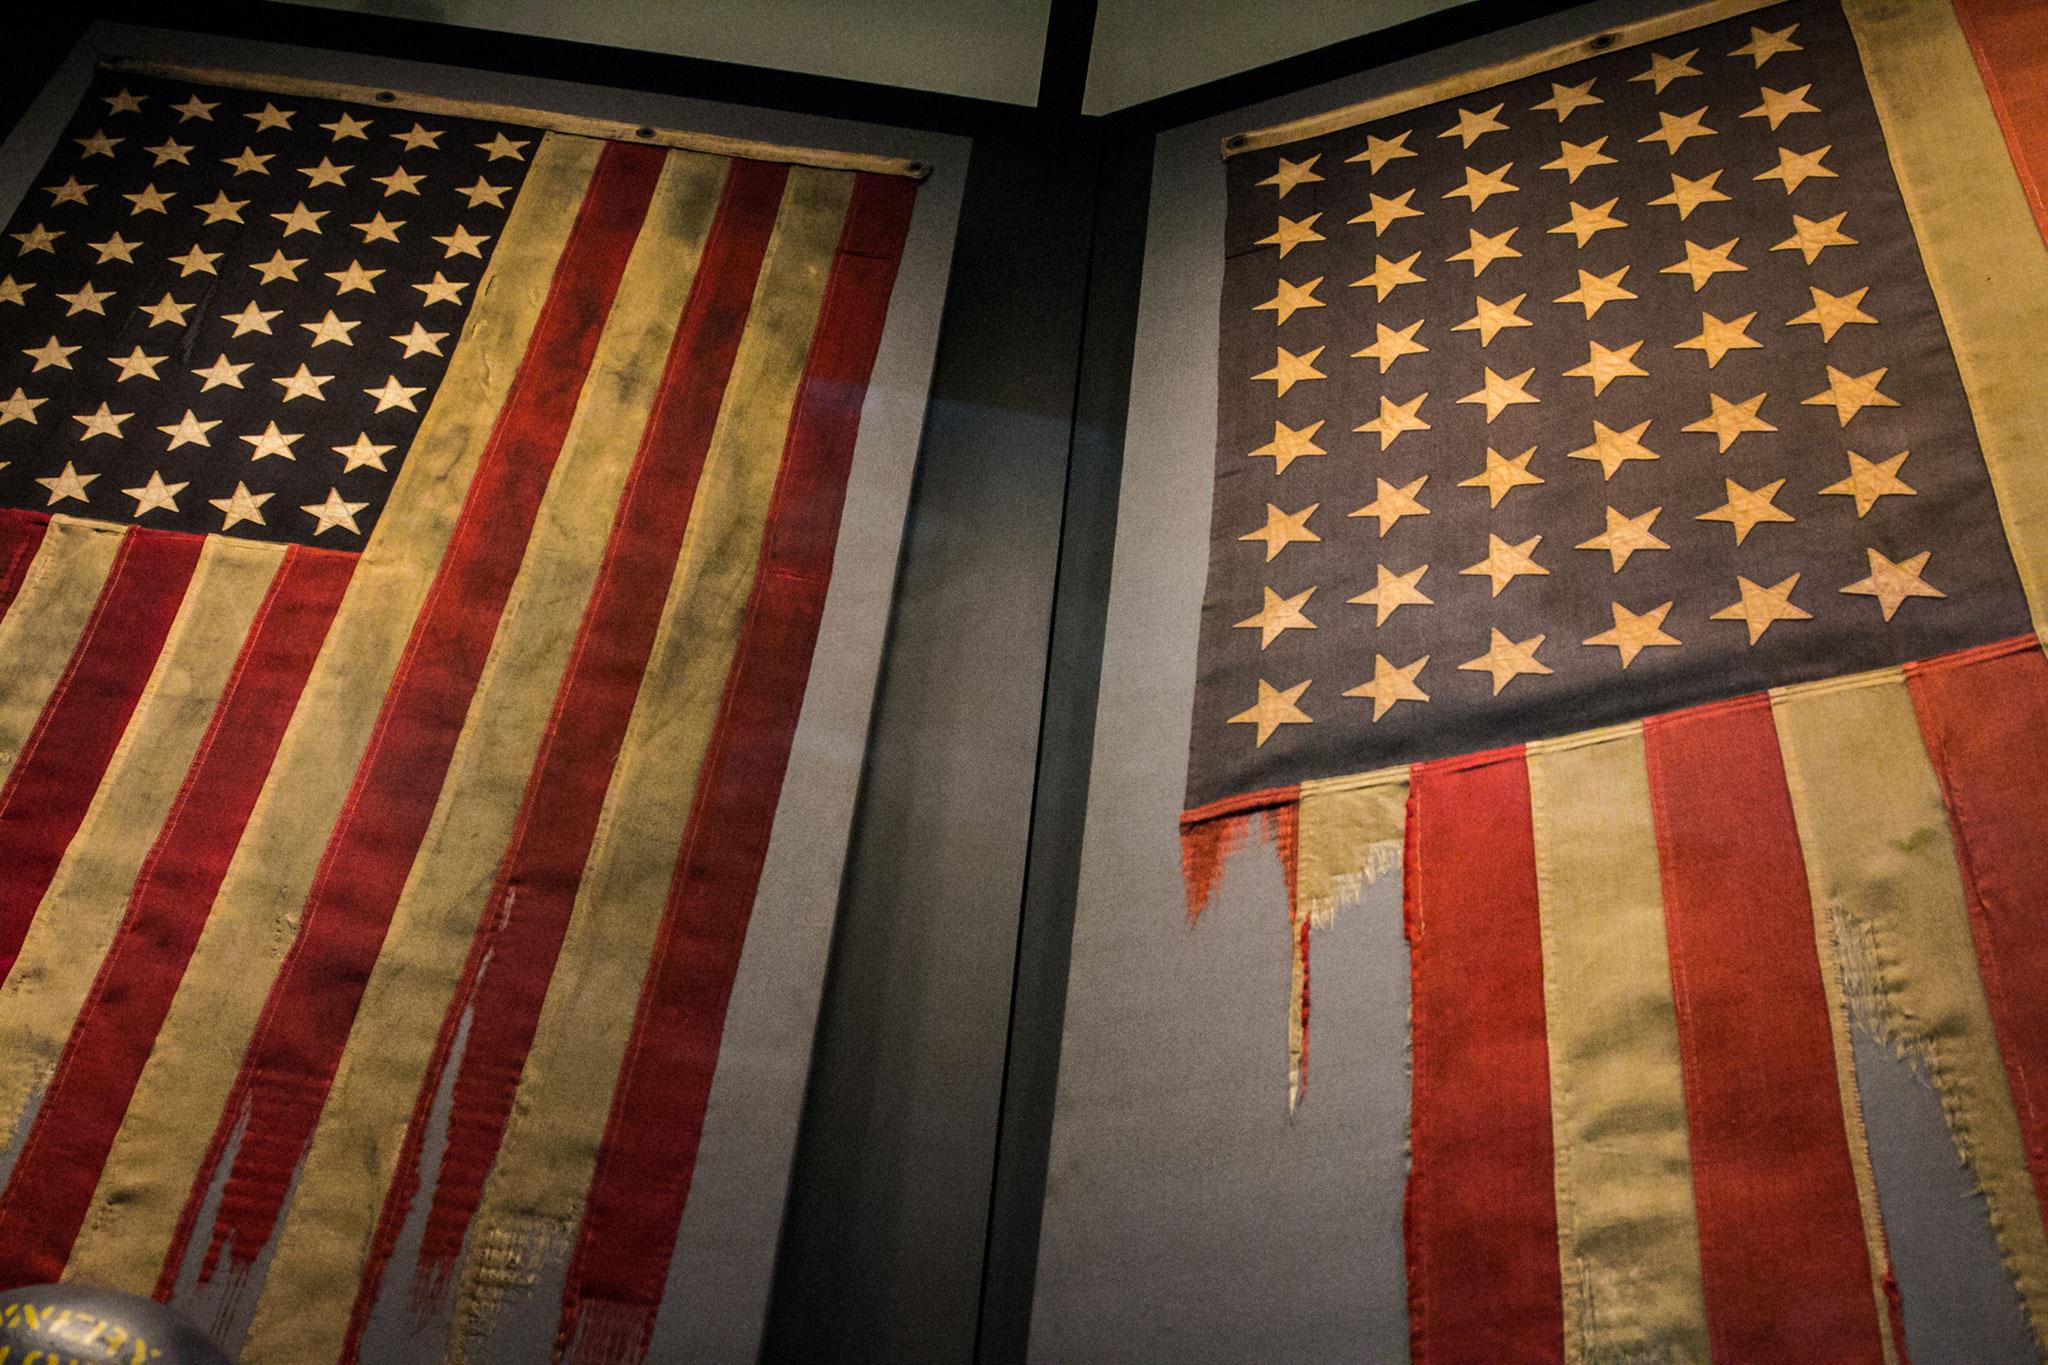 American flags inside The National World War II Museum. (Photo: Rebecca Ratliff)